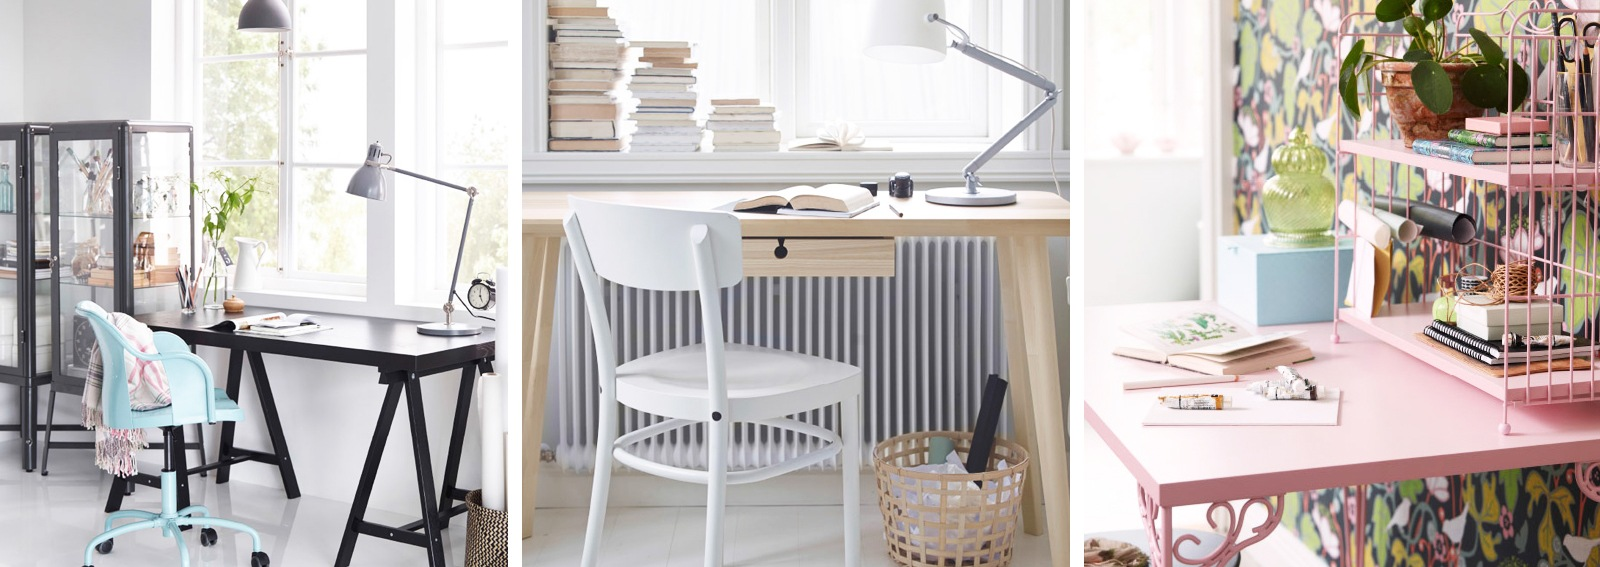 Divisori stanze ikea with divisori stanze ikea find this - Ikea scrivanie per camerette ...